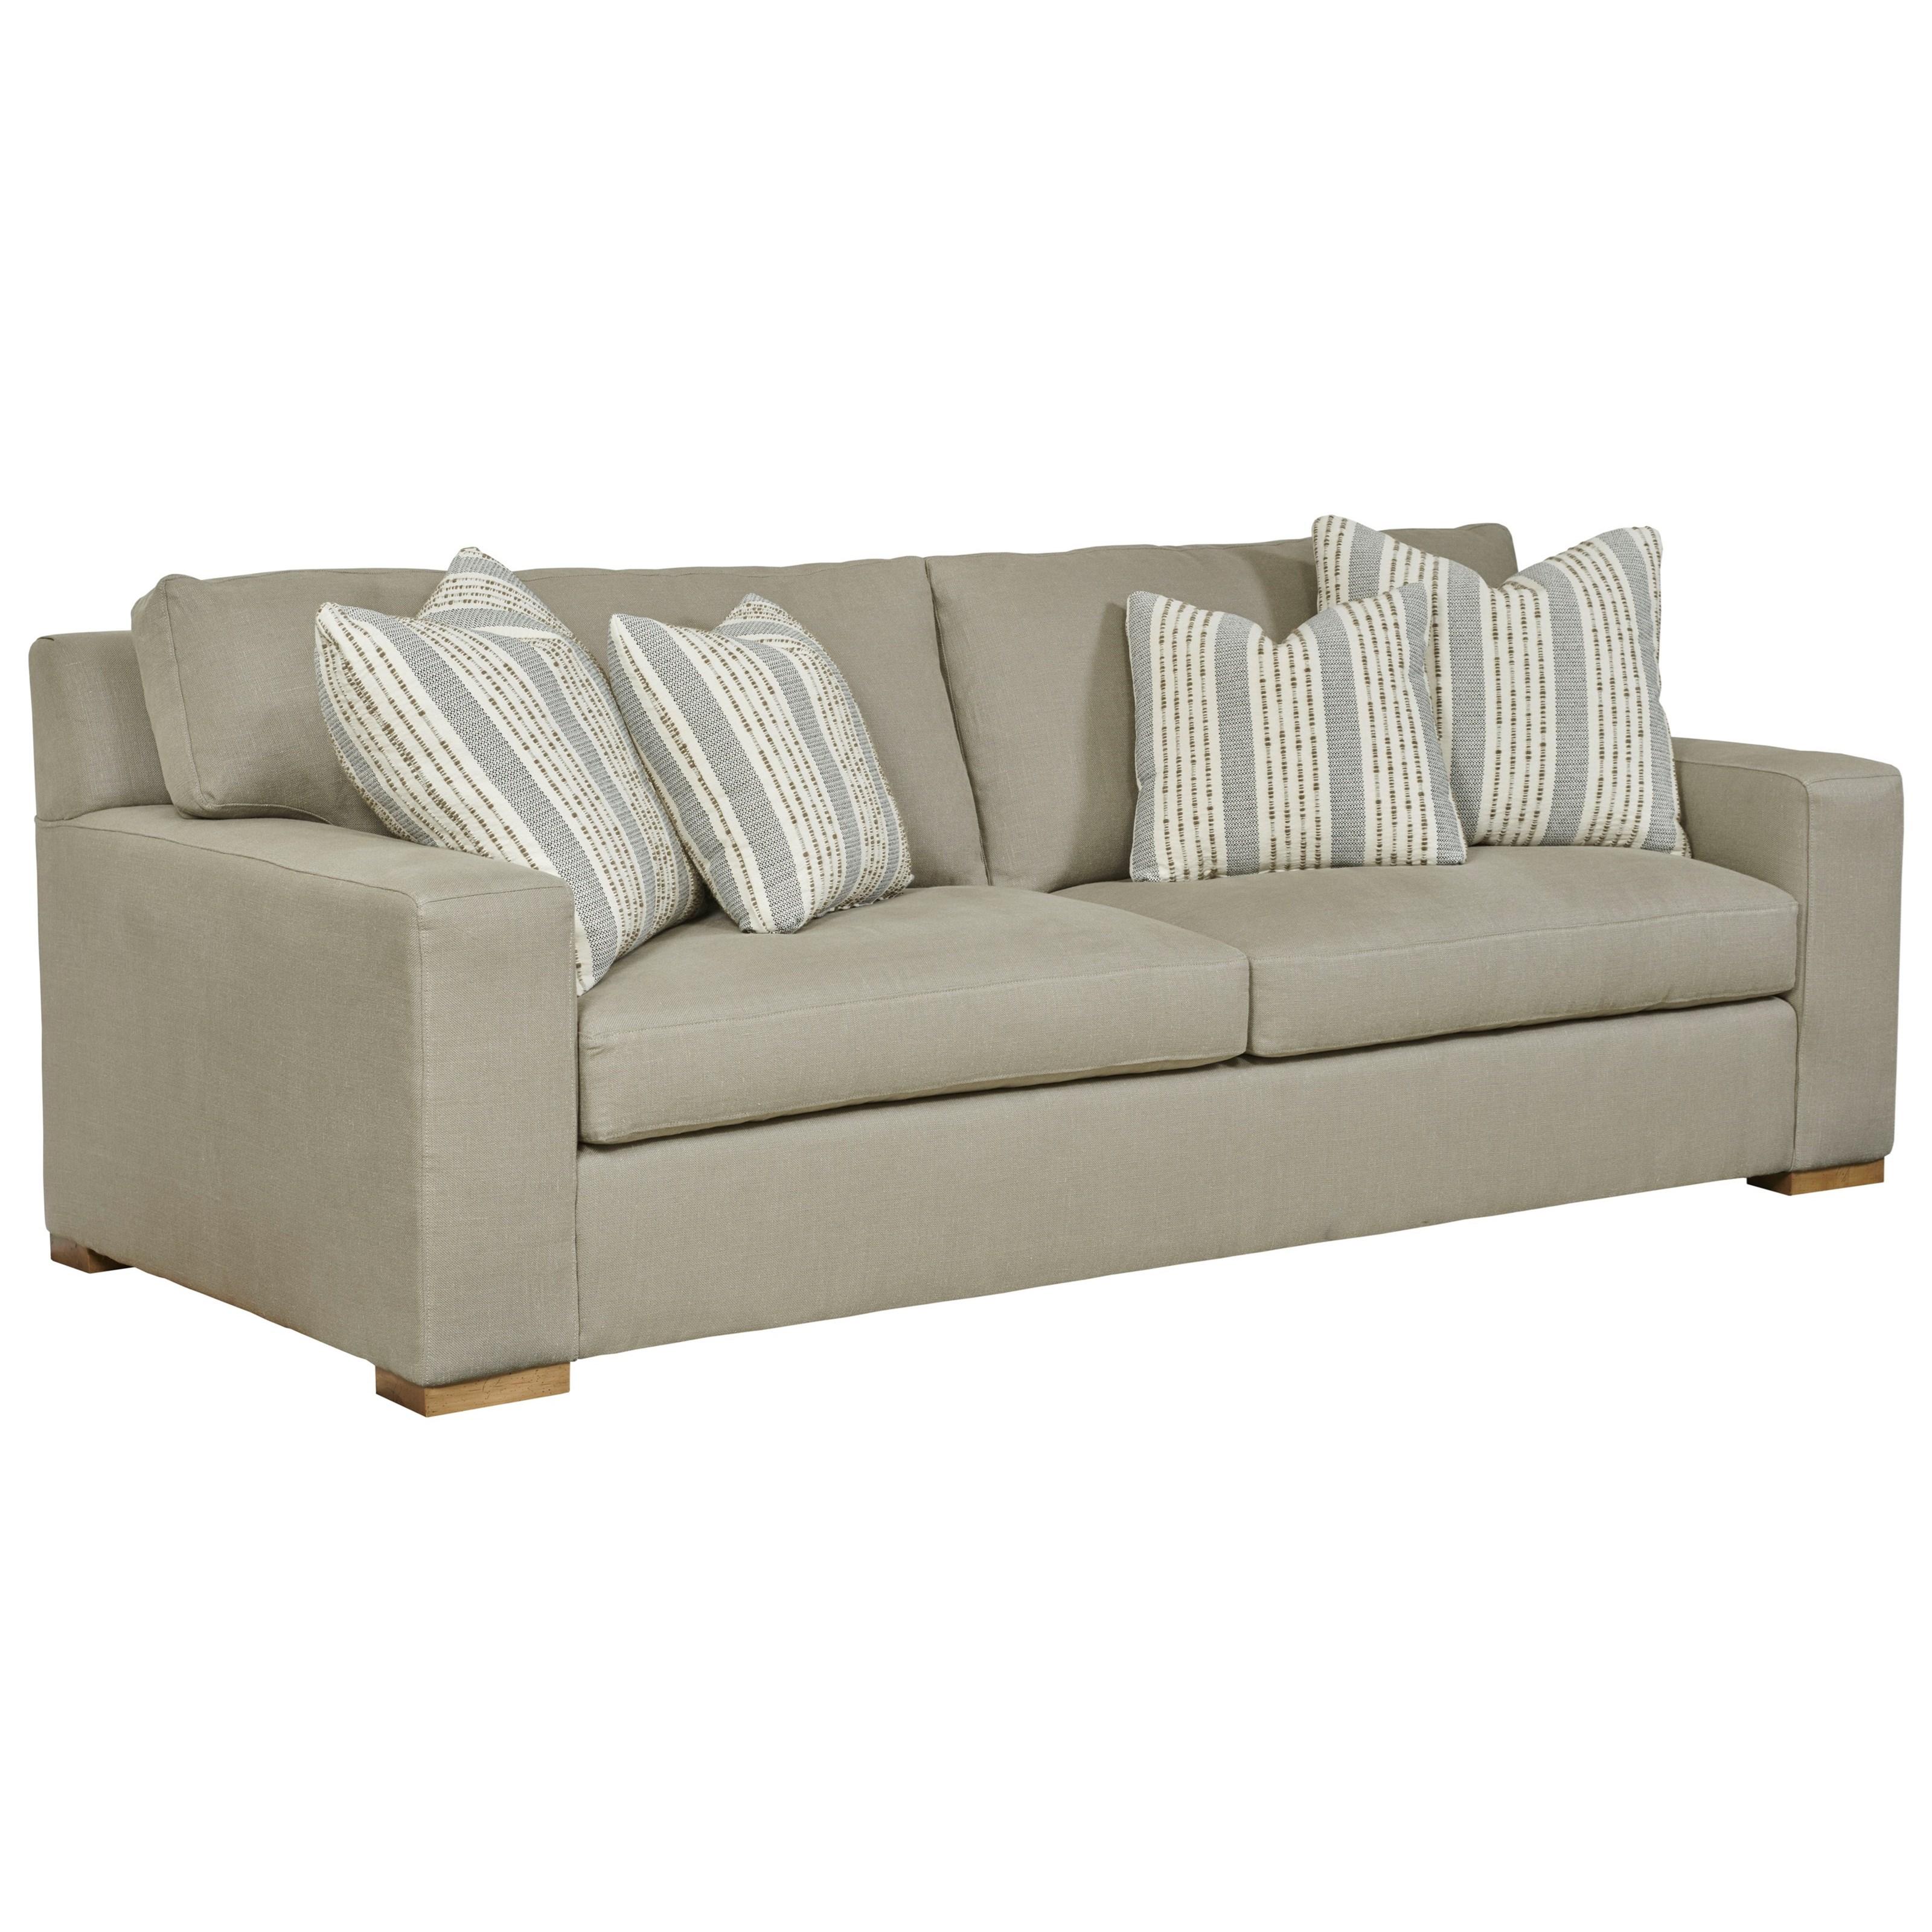 Comfort Select Sofa by Kincaid Furniture at Johnny Janosik